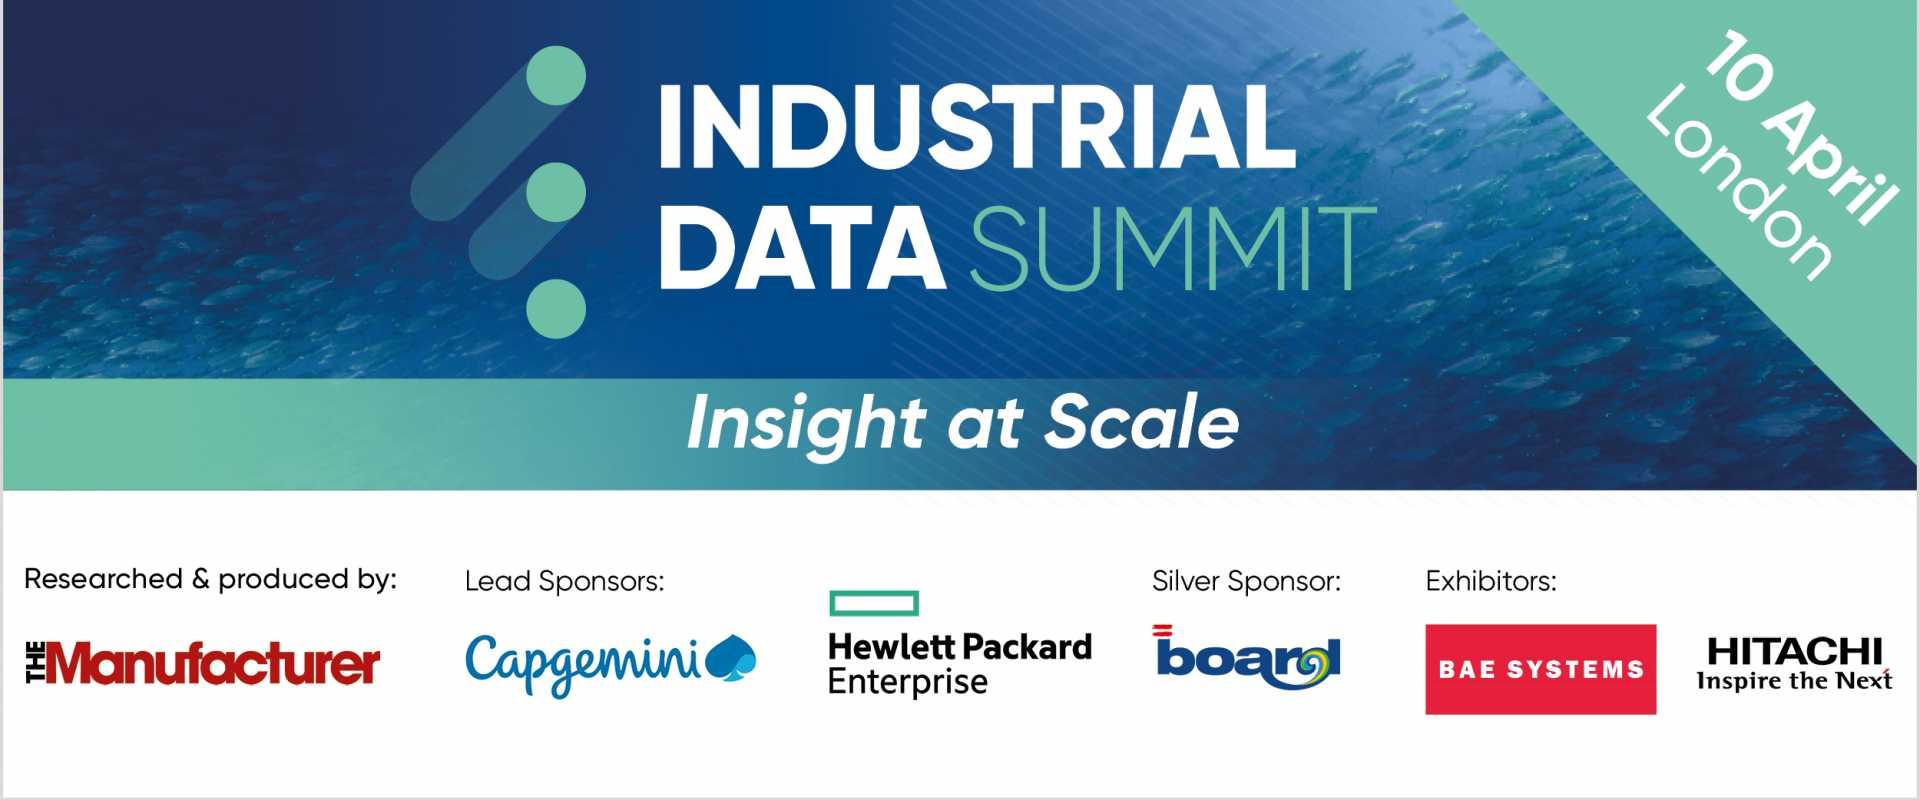 Digital Transformation - Industrial Data Summit 2019 - March Banner